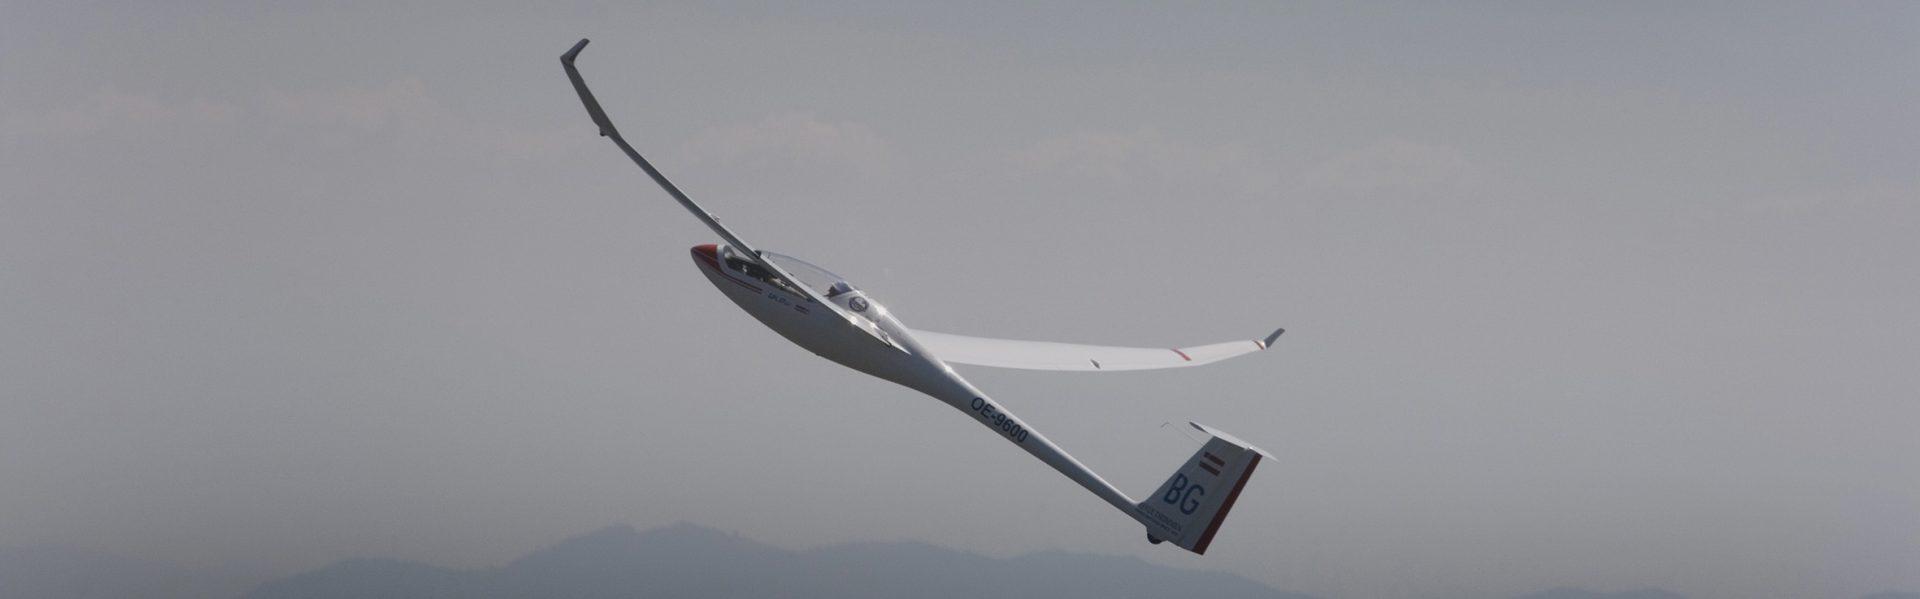 Hirter Flugsportclub